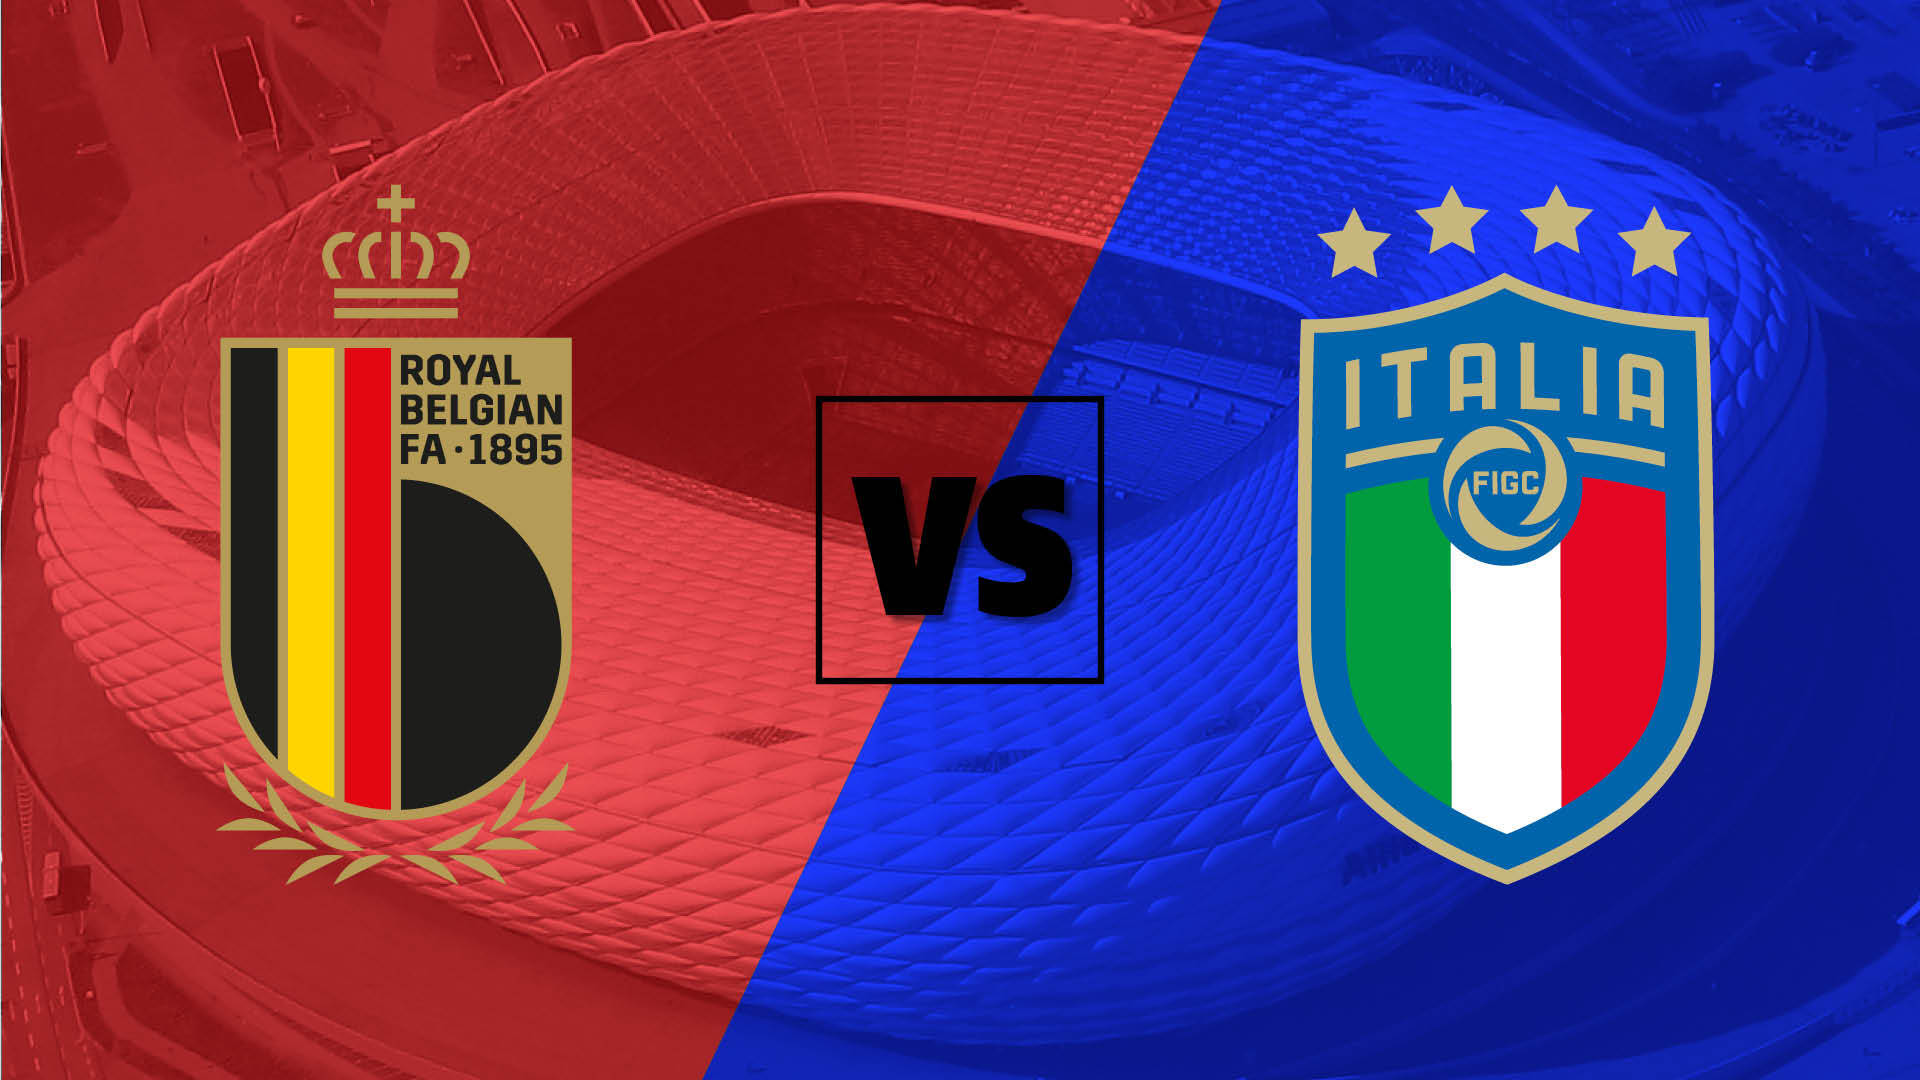 بث مباشر مباراة ايطاليا وبلجيكا